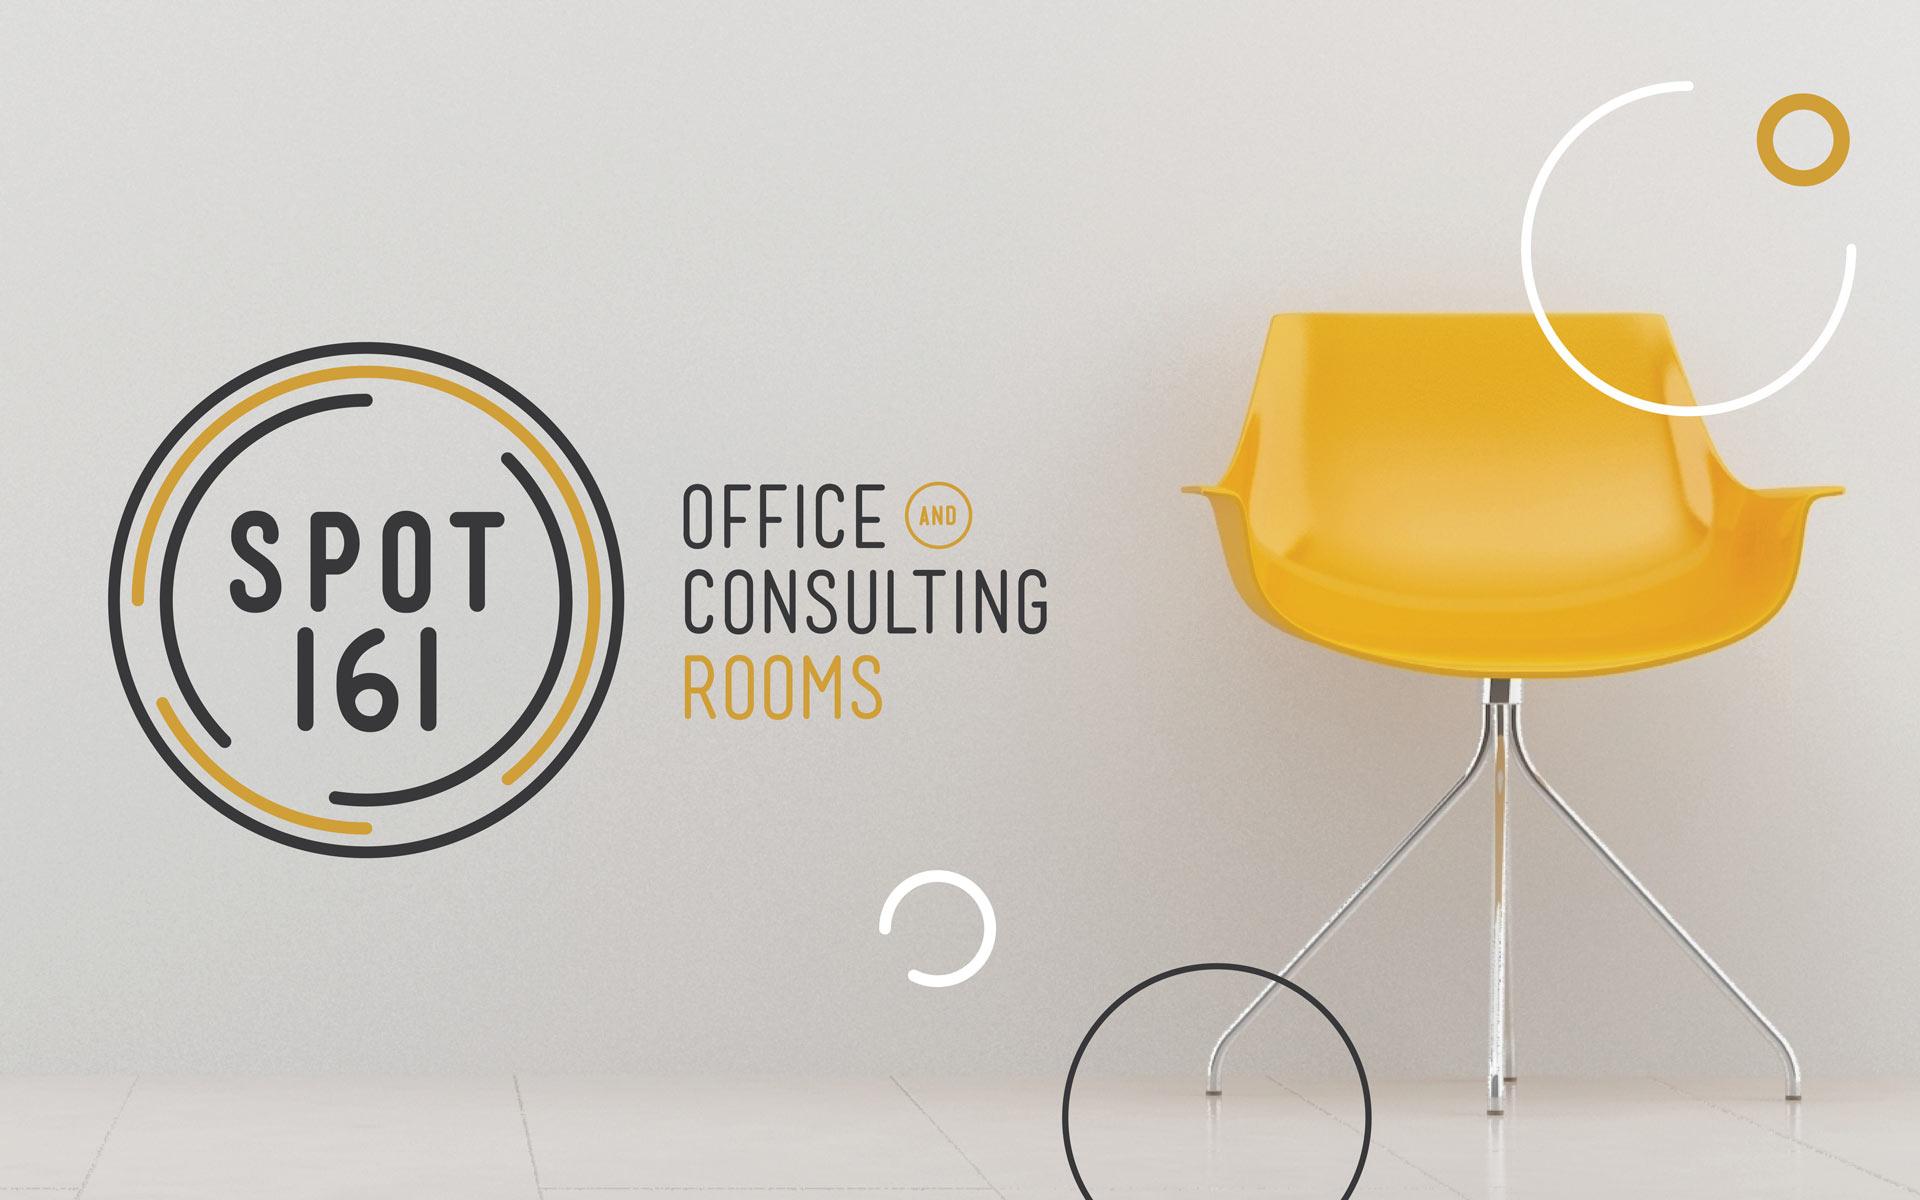 Spot 161 Logo Design